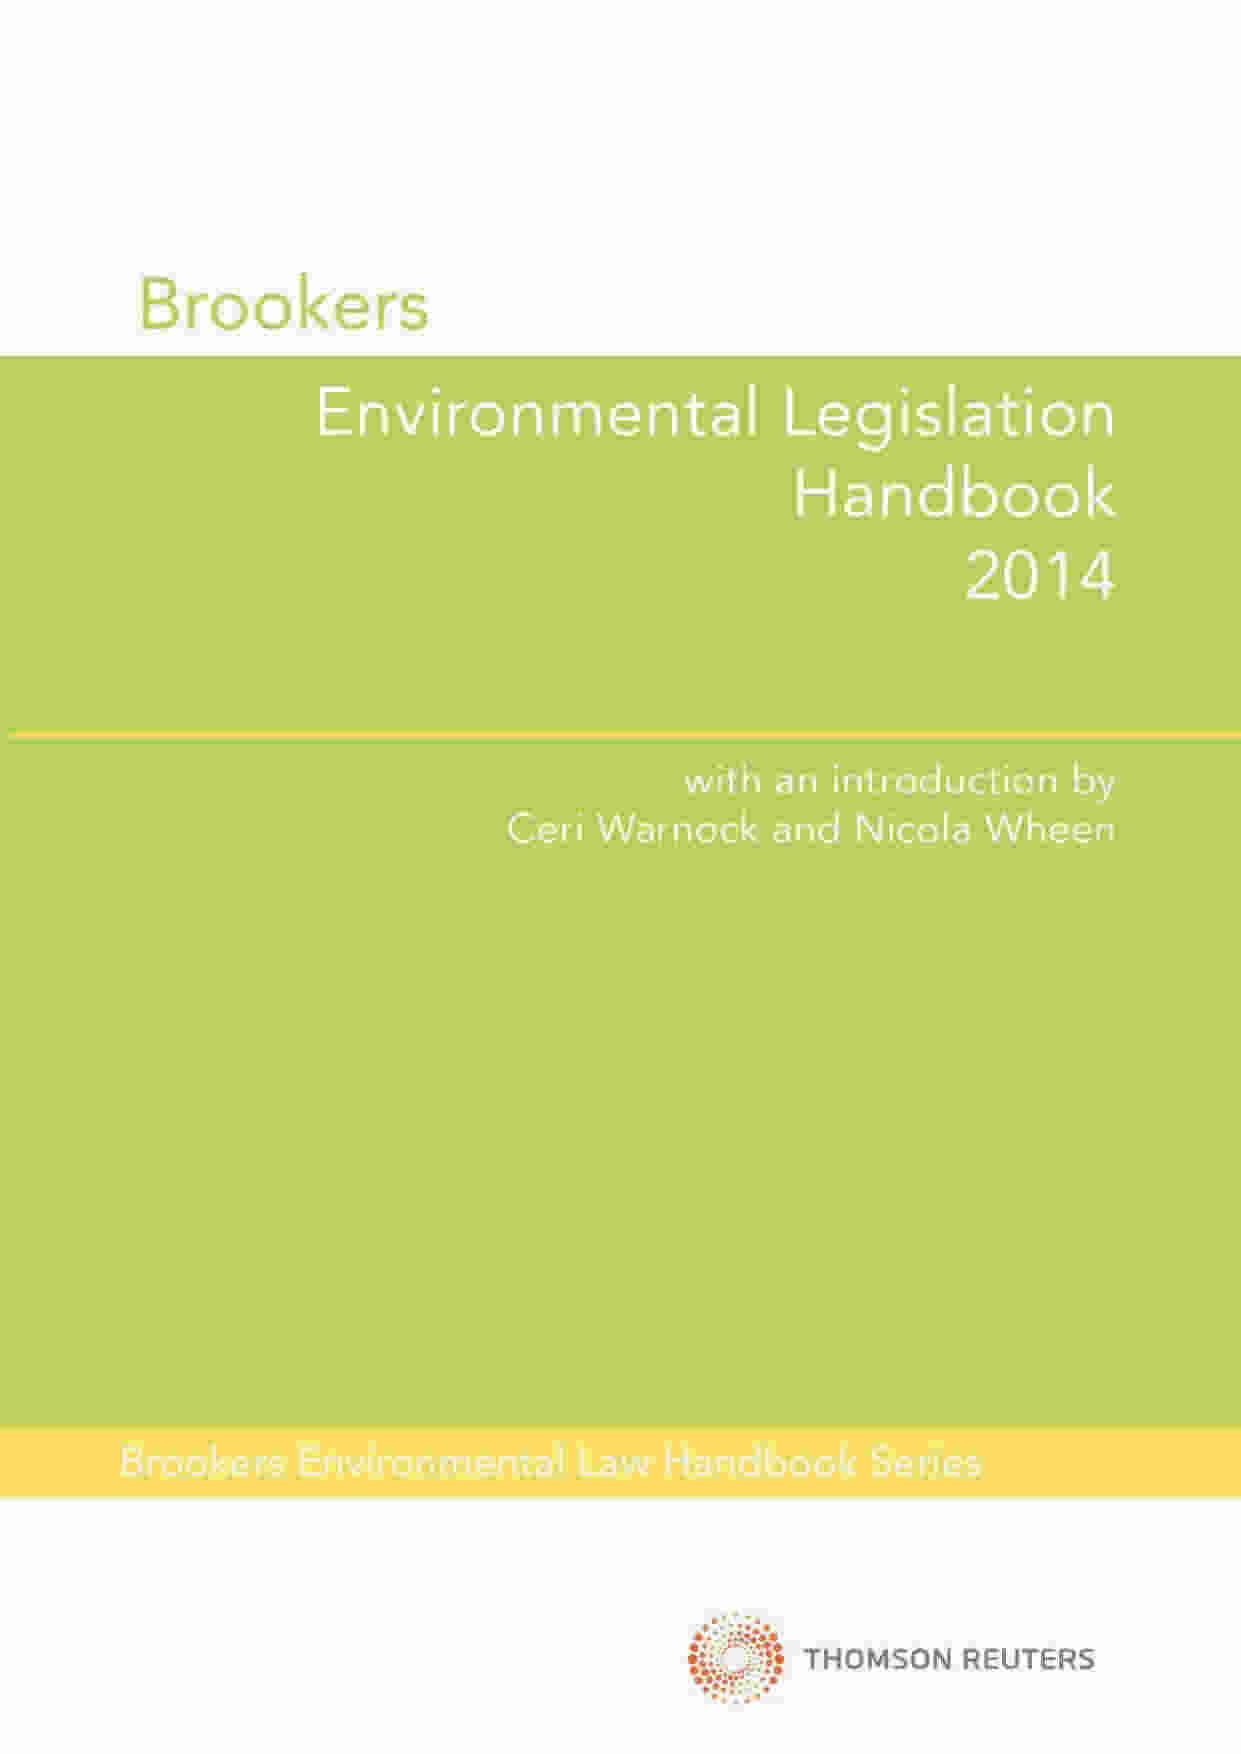 Immigration law handbook 2011 ebook environmental legislation handbook 2014 book fandeluxe Gallery